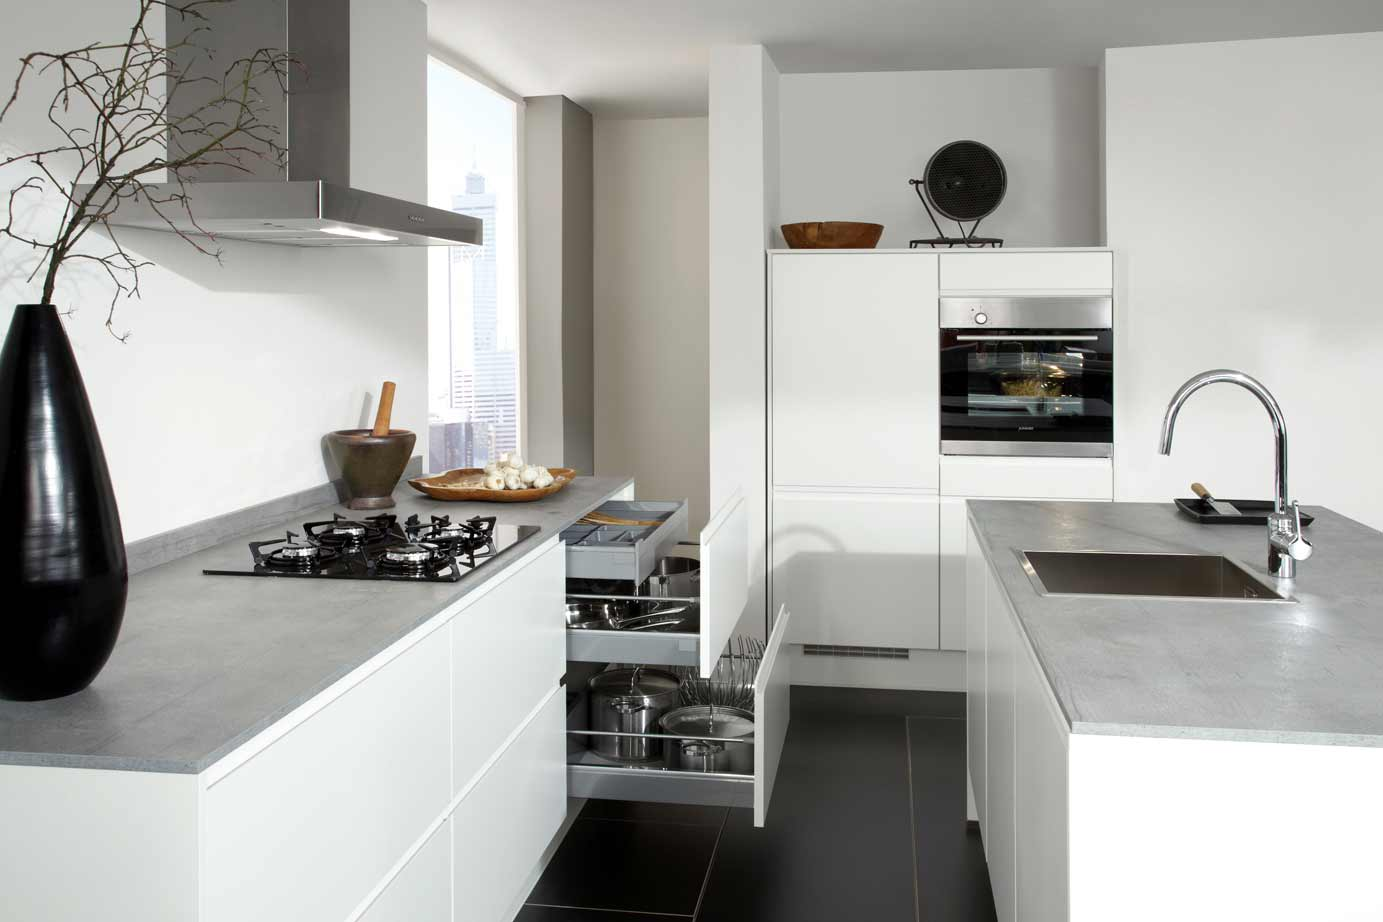 Design Keuken Showroom : Keuken ontwerpen maak kennis met slimme techniek keur